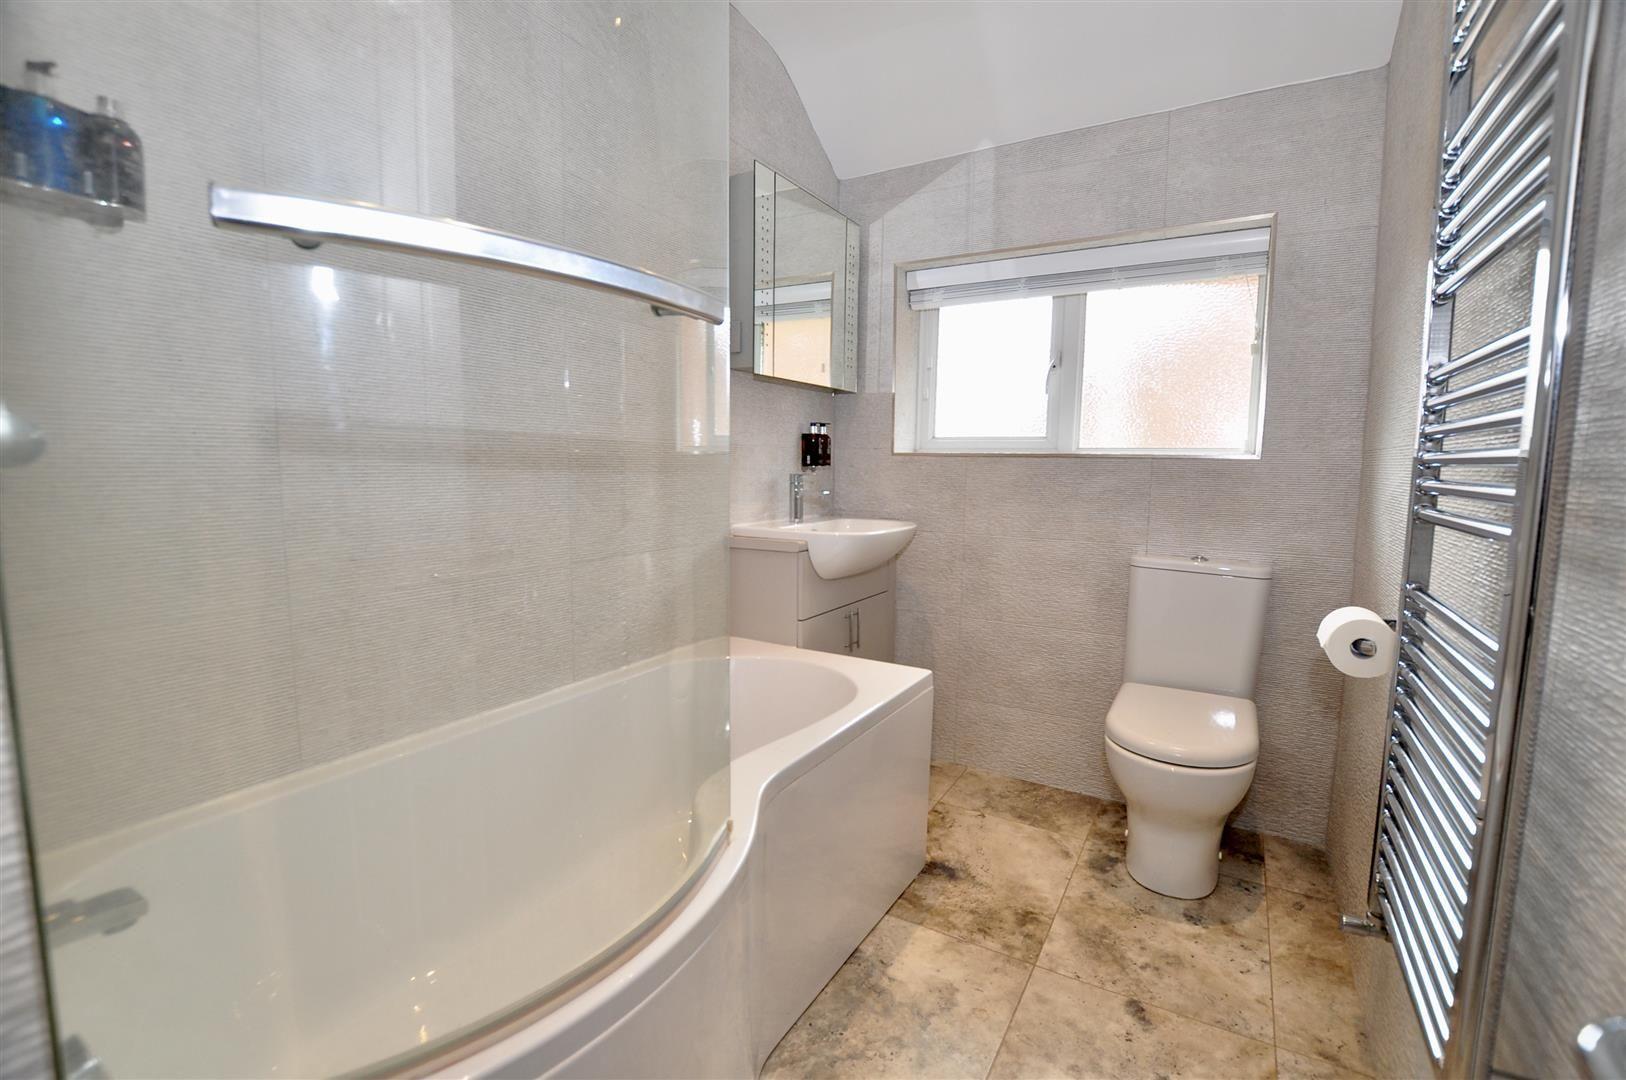 4 bed link-detached-house for sale in Hagley  - Property Image 12